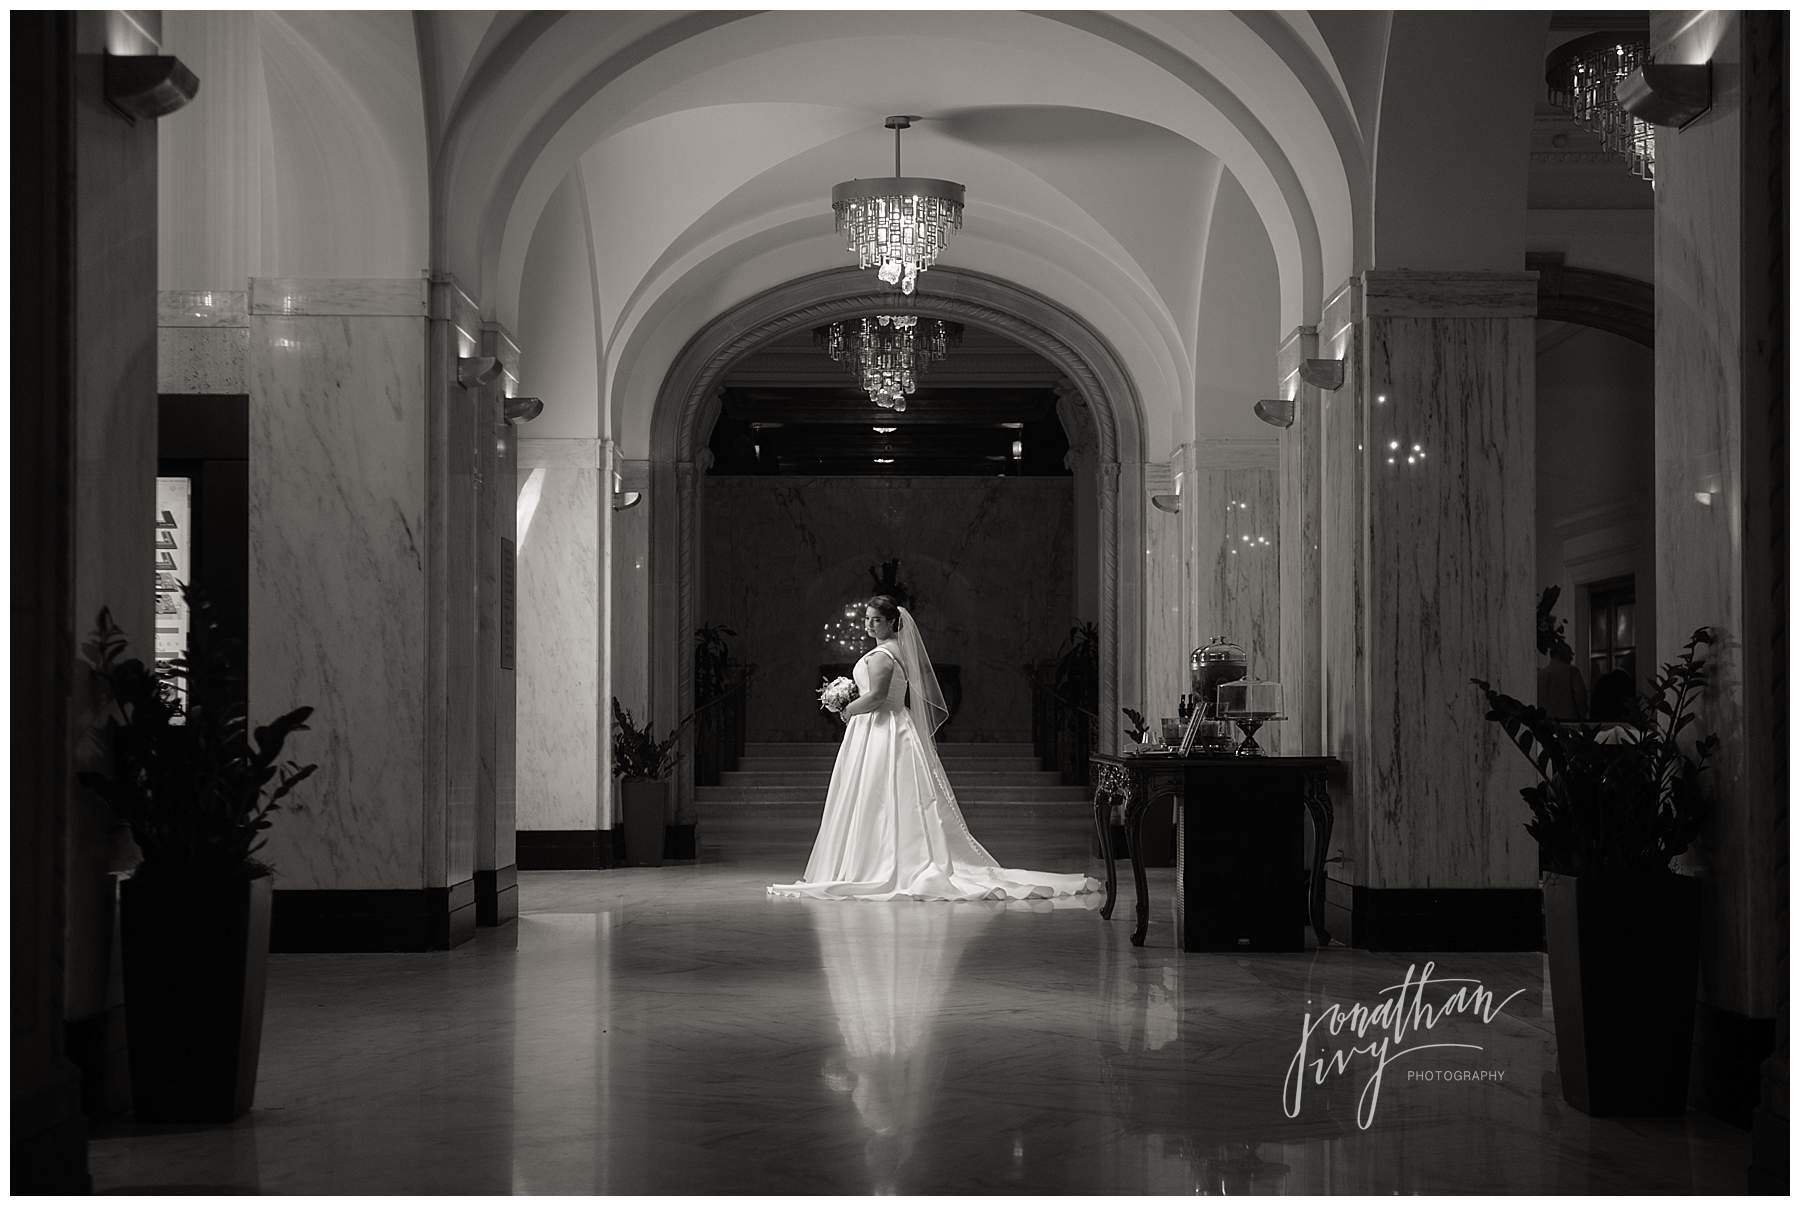 St. Anthony's Hotel Bridal Photos – Victoria's Bridals